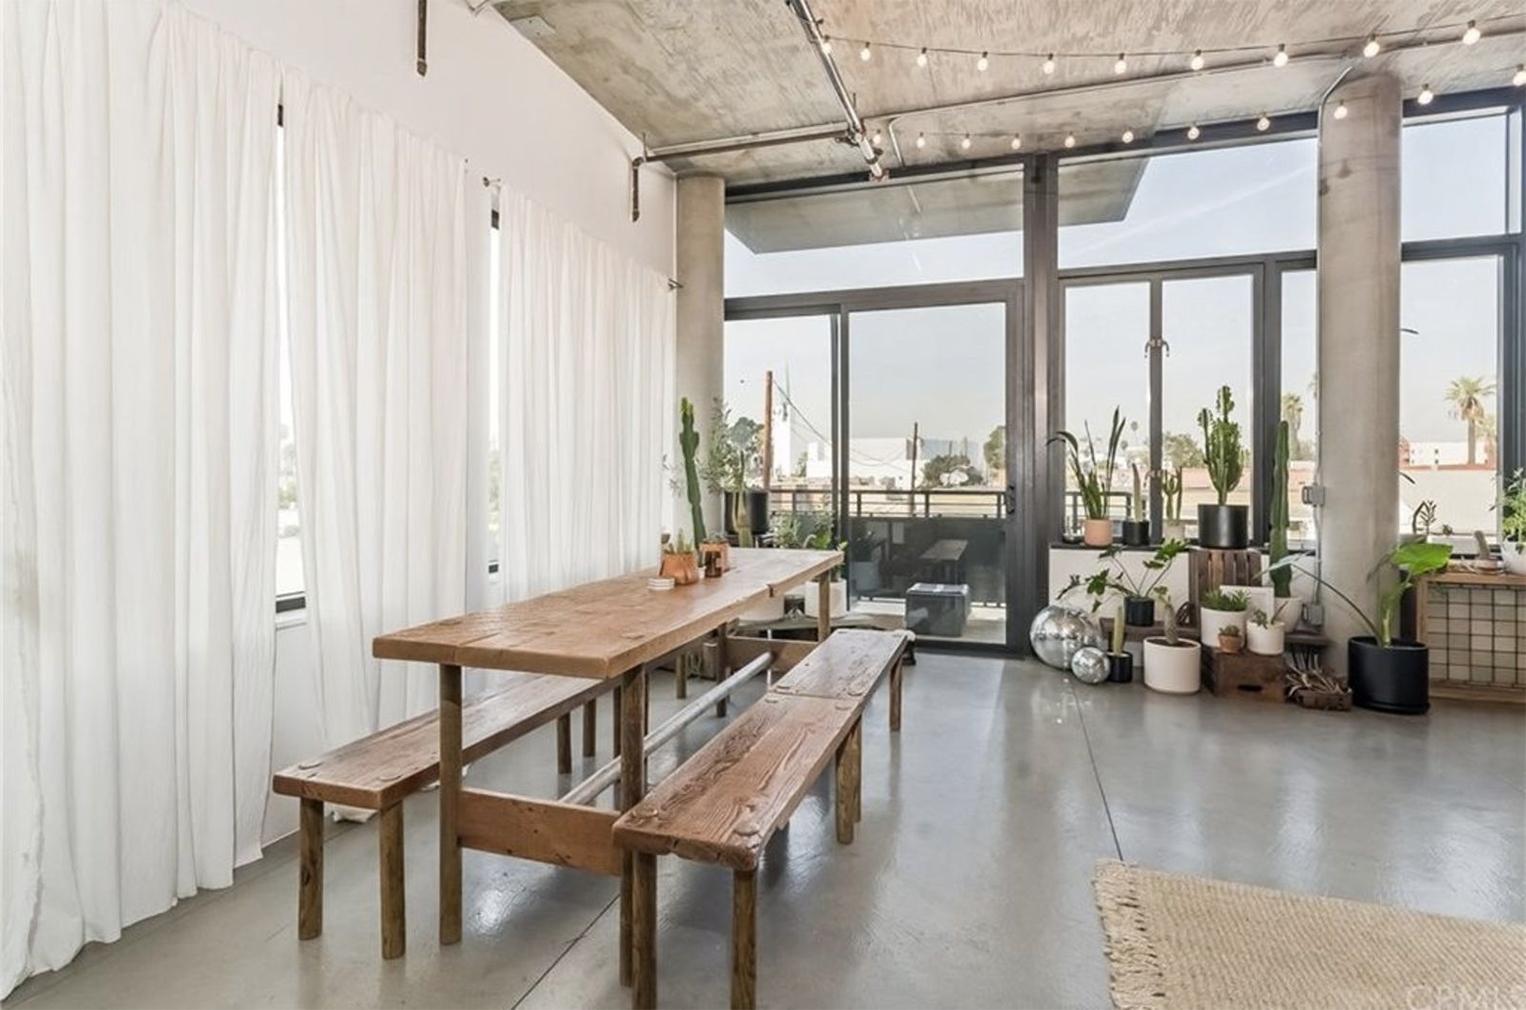 Long Beach loft in a former Masonic temple lists for $639k